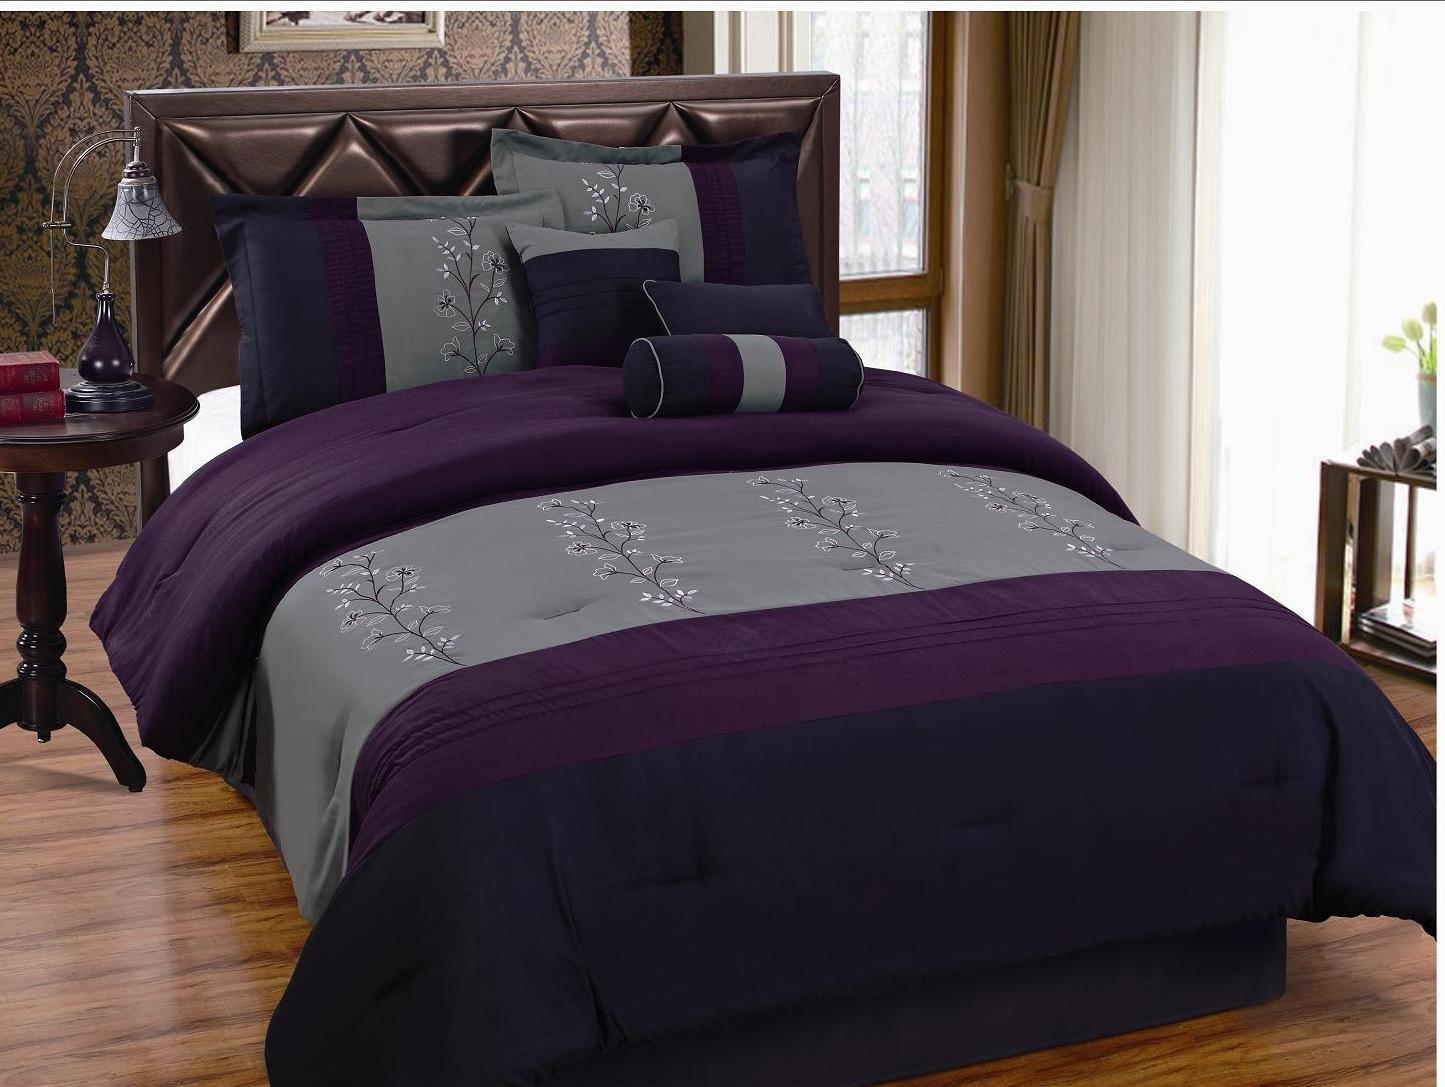 Cheap Purple Full Size Comforter Set Find Purple Full Size Comforter Set Deals On Line At Alibaba Com